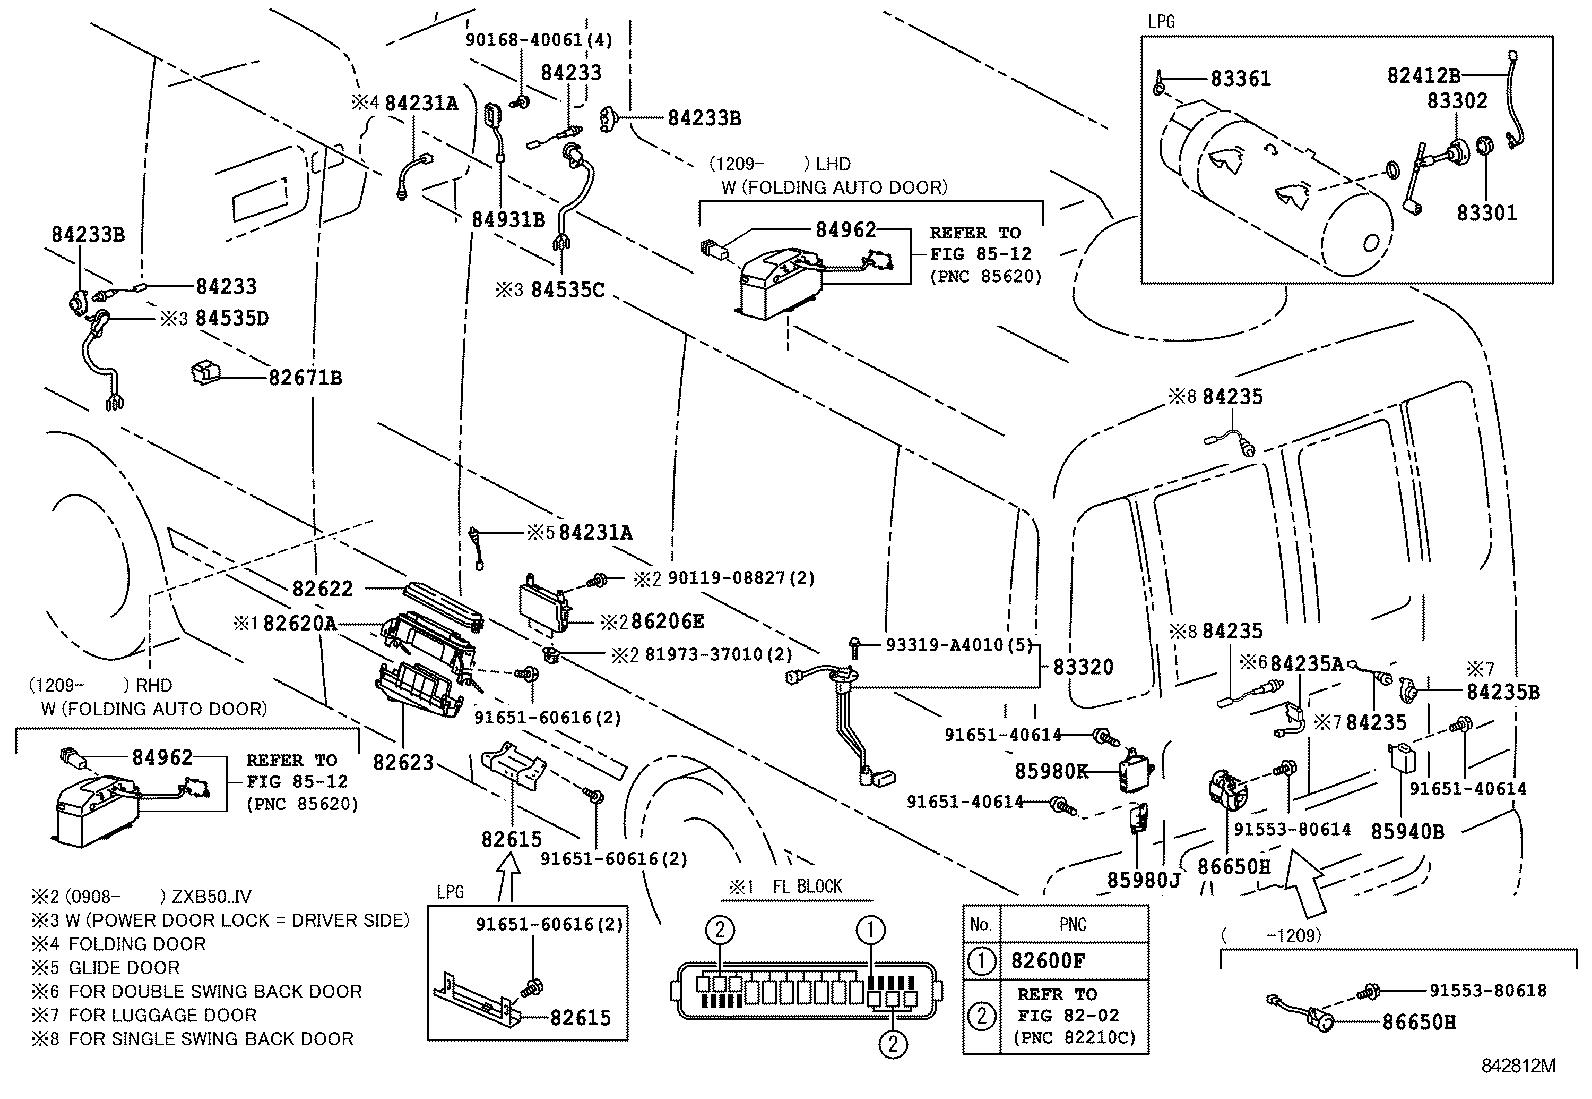 toyota coasterhzb50r-zgmss - electrical